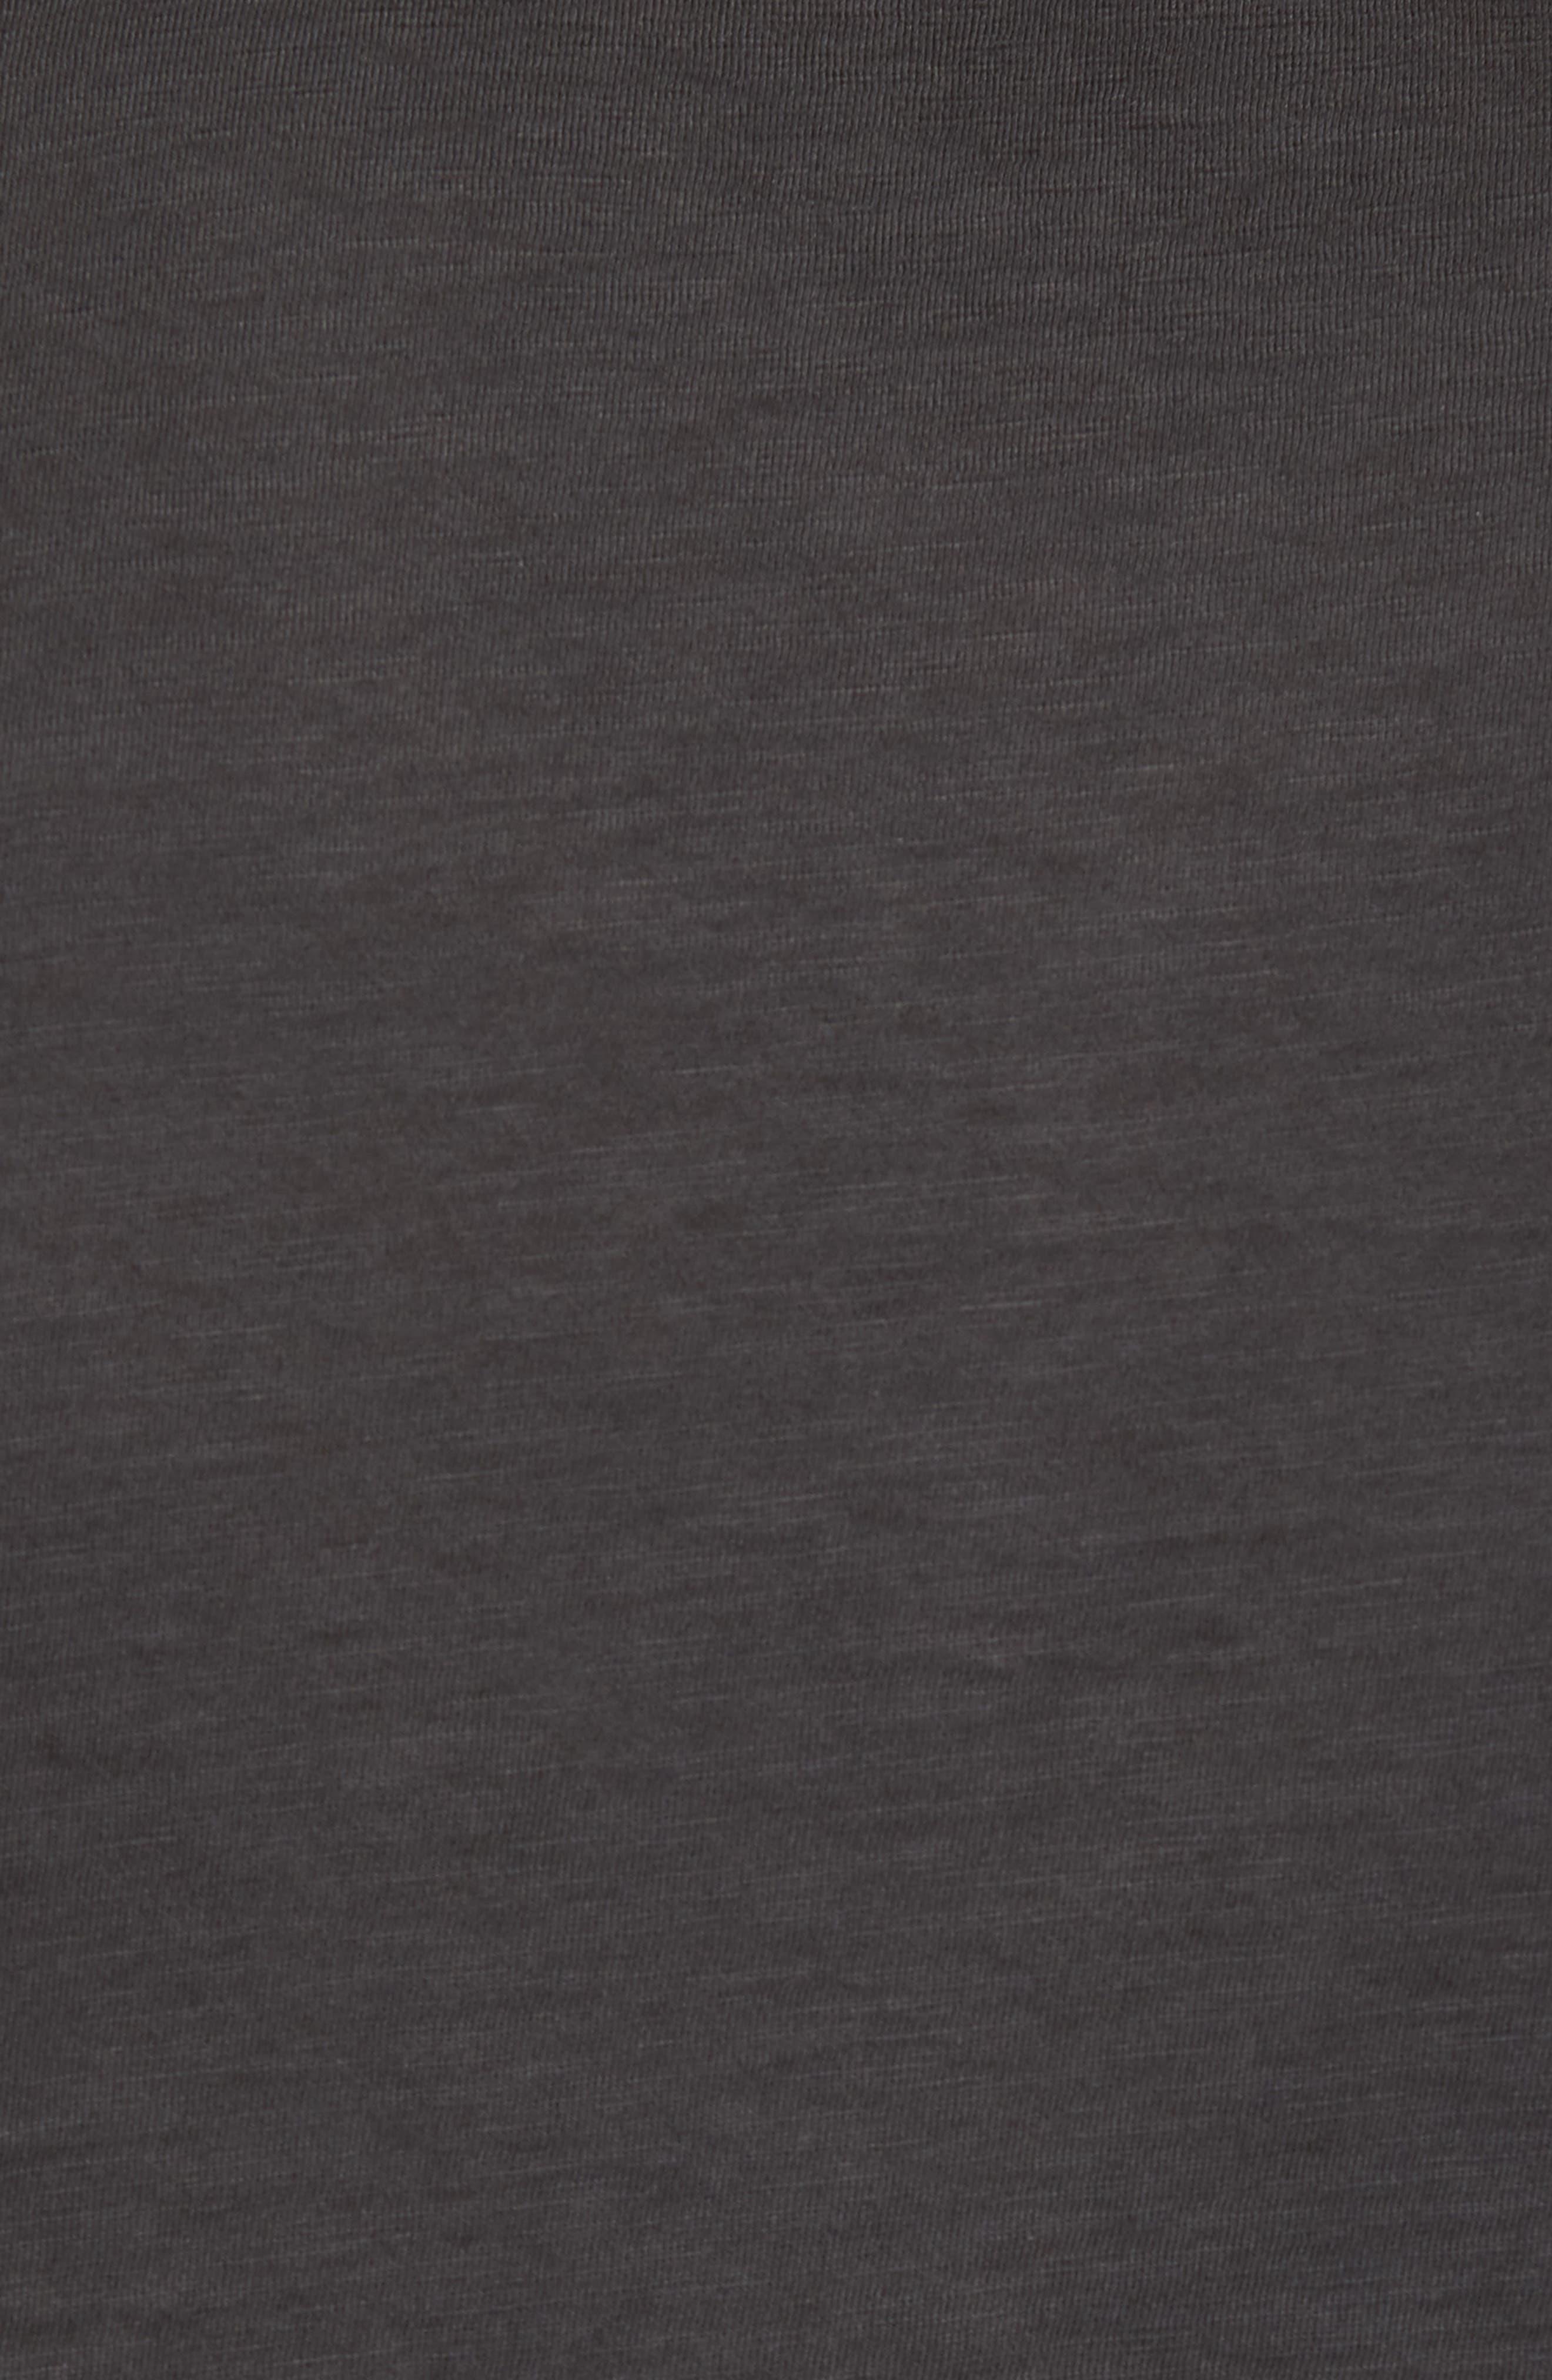 Sunwash Henley T-Shirt,                             Alternate thumbnail 21, color,